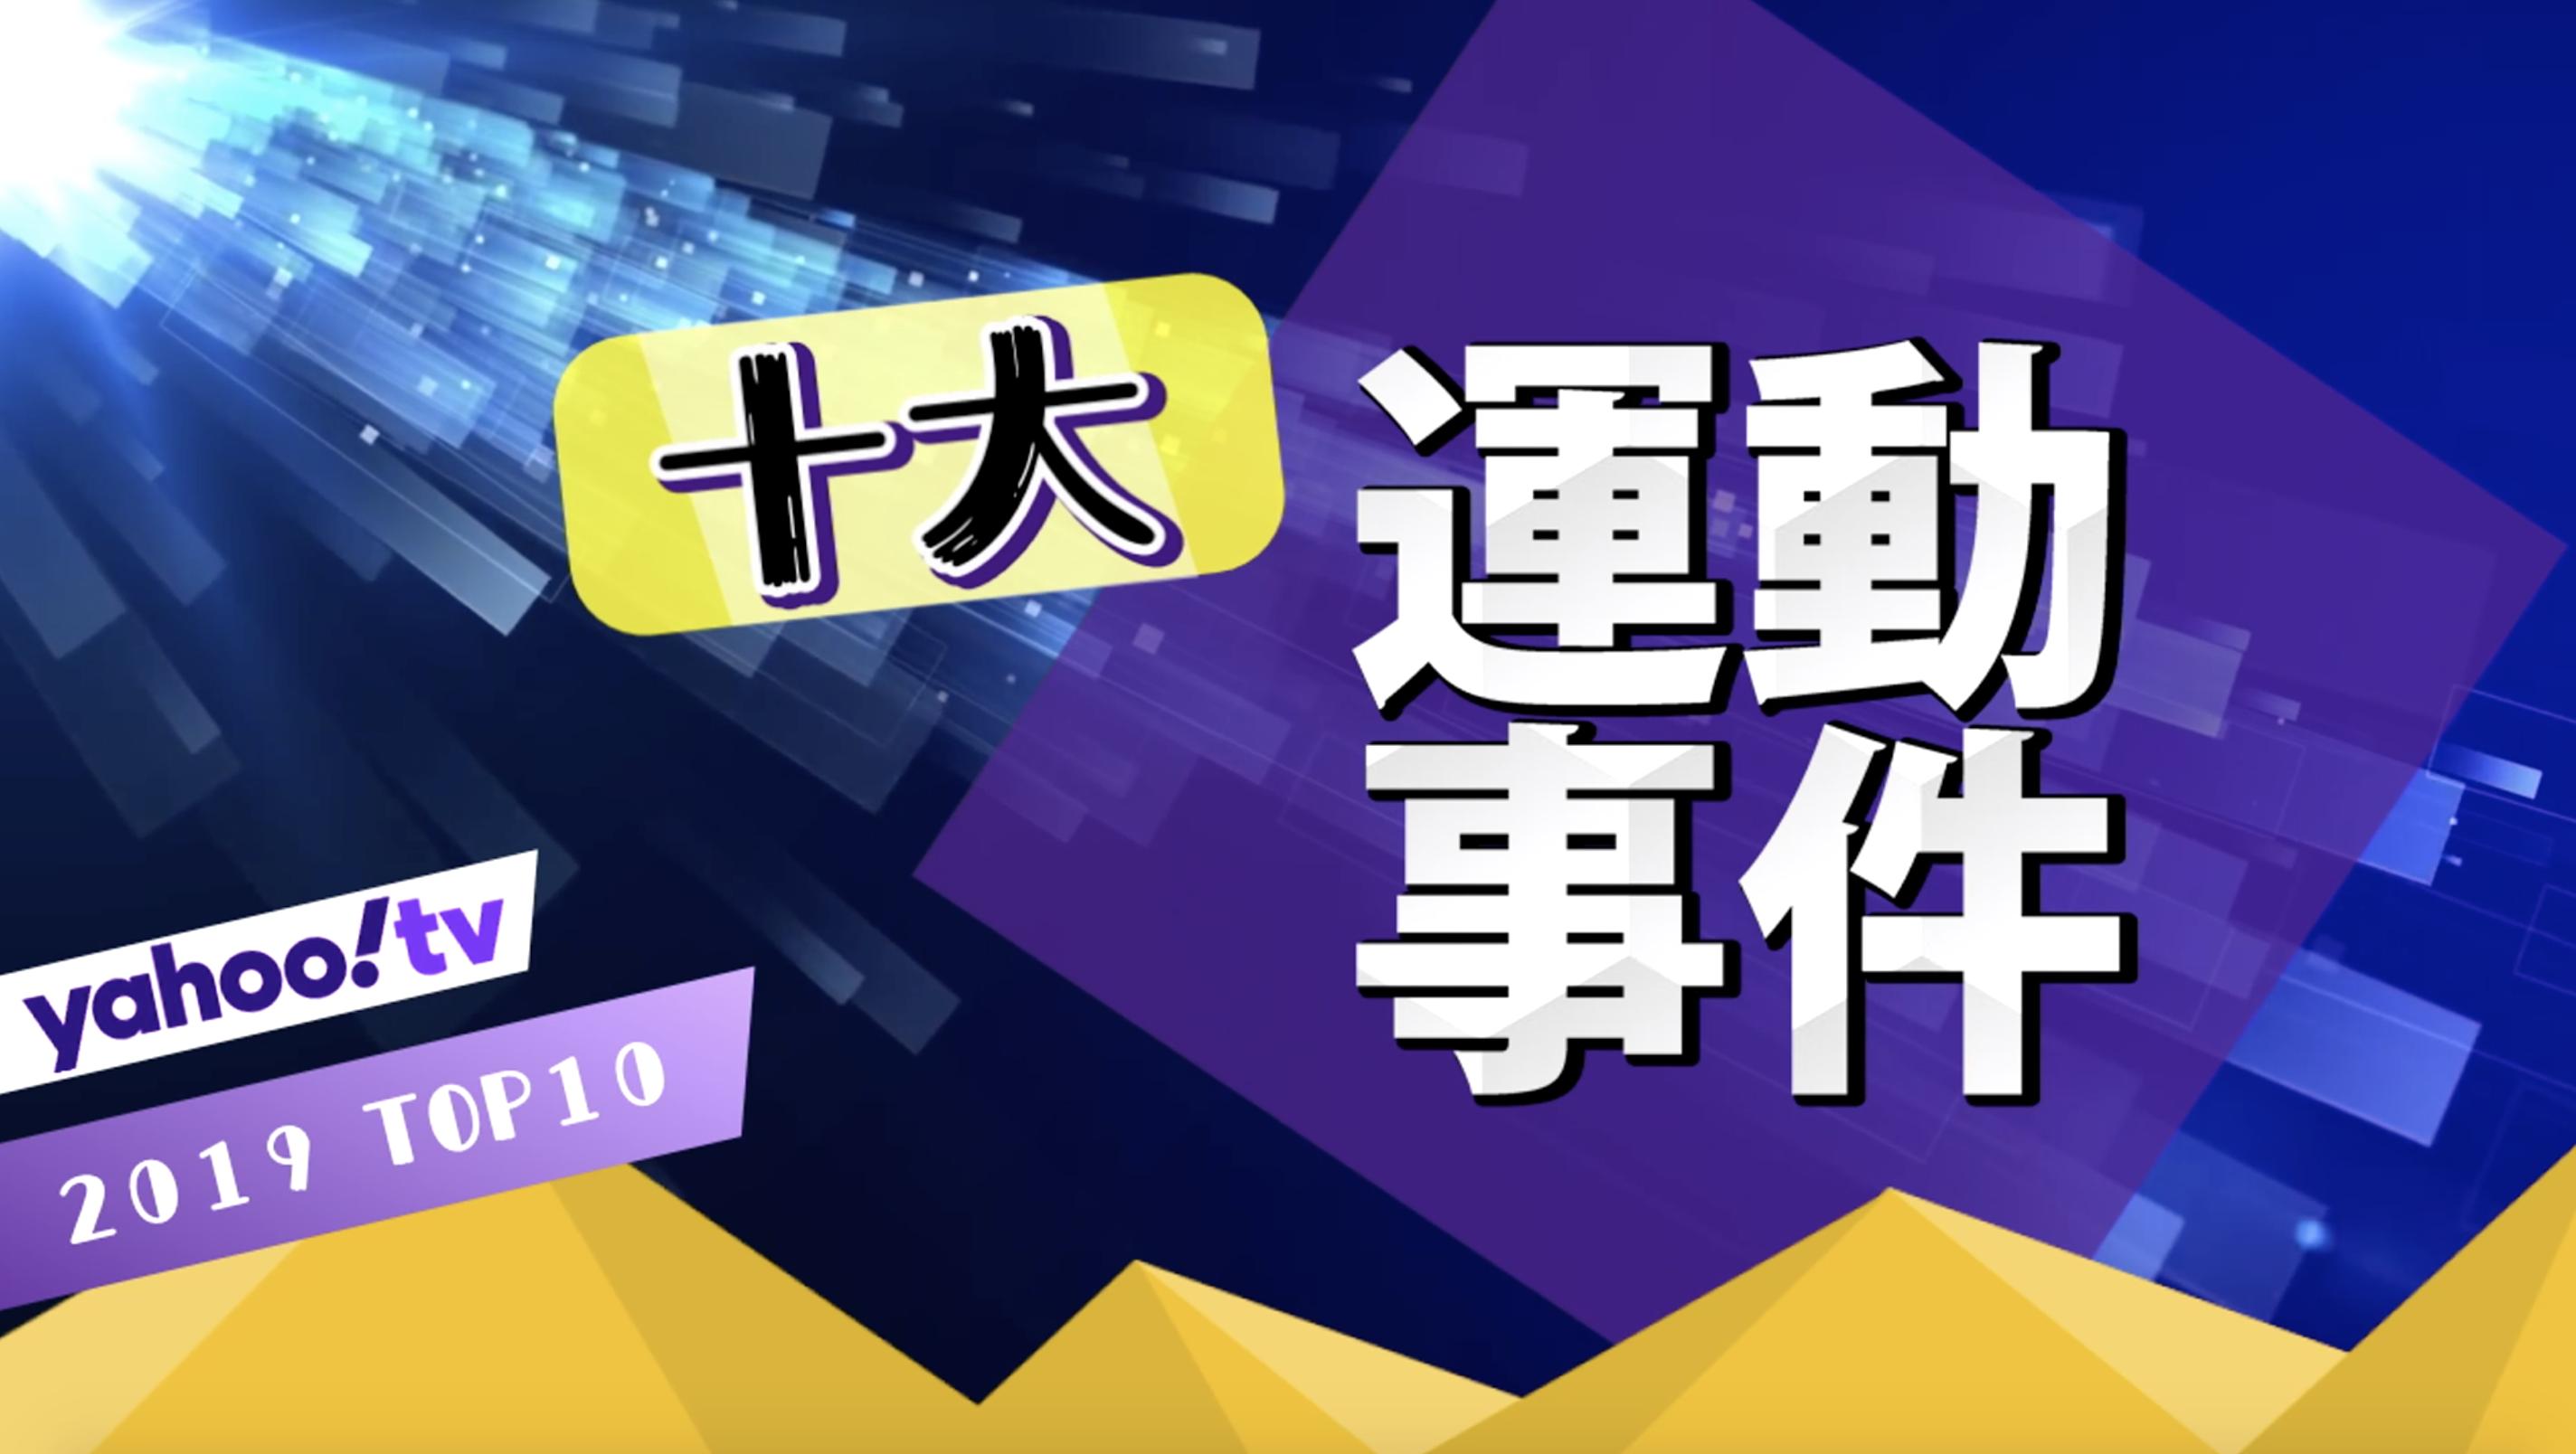 【Yahoo奇摩十大熱搜運動事件】 中華隊2019年冠軍大豐收 U18、U12稱霸世界